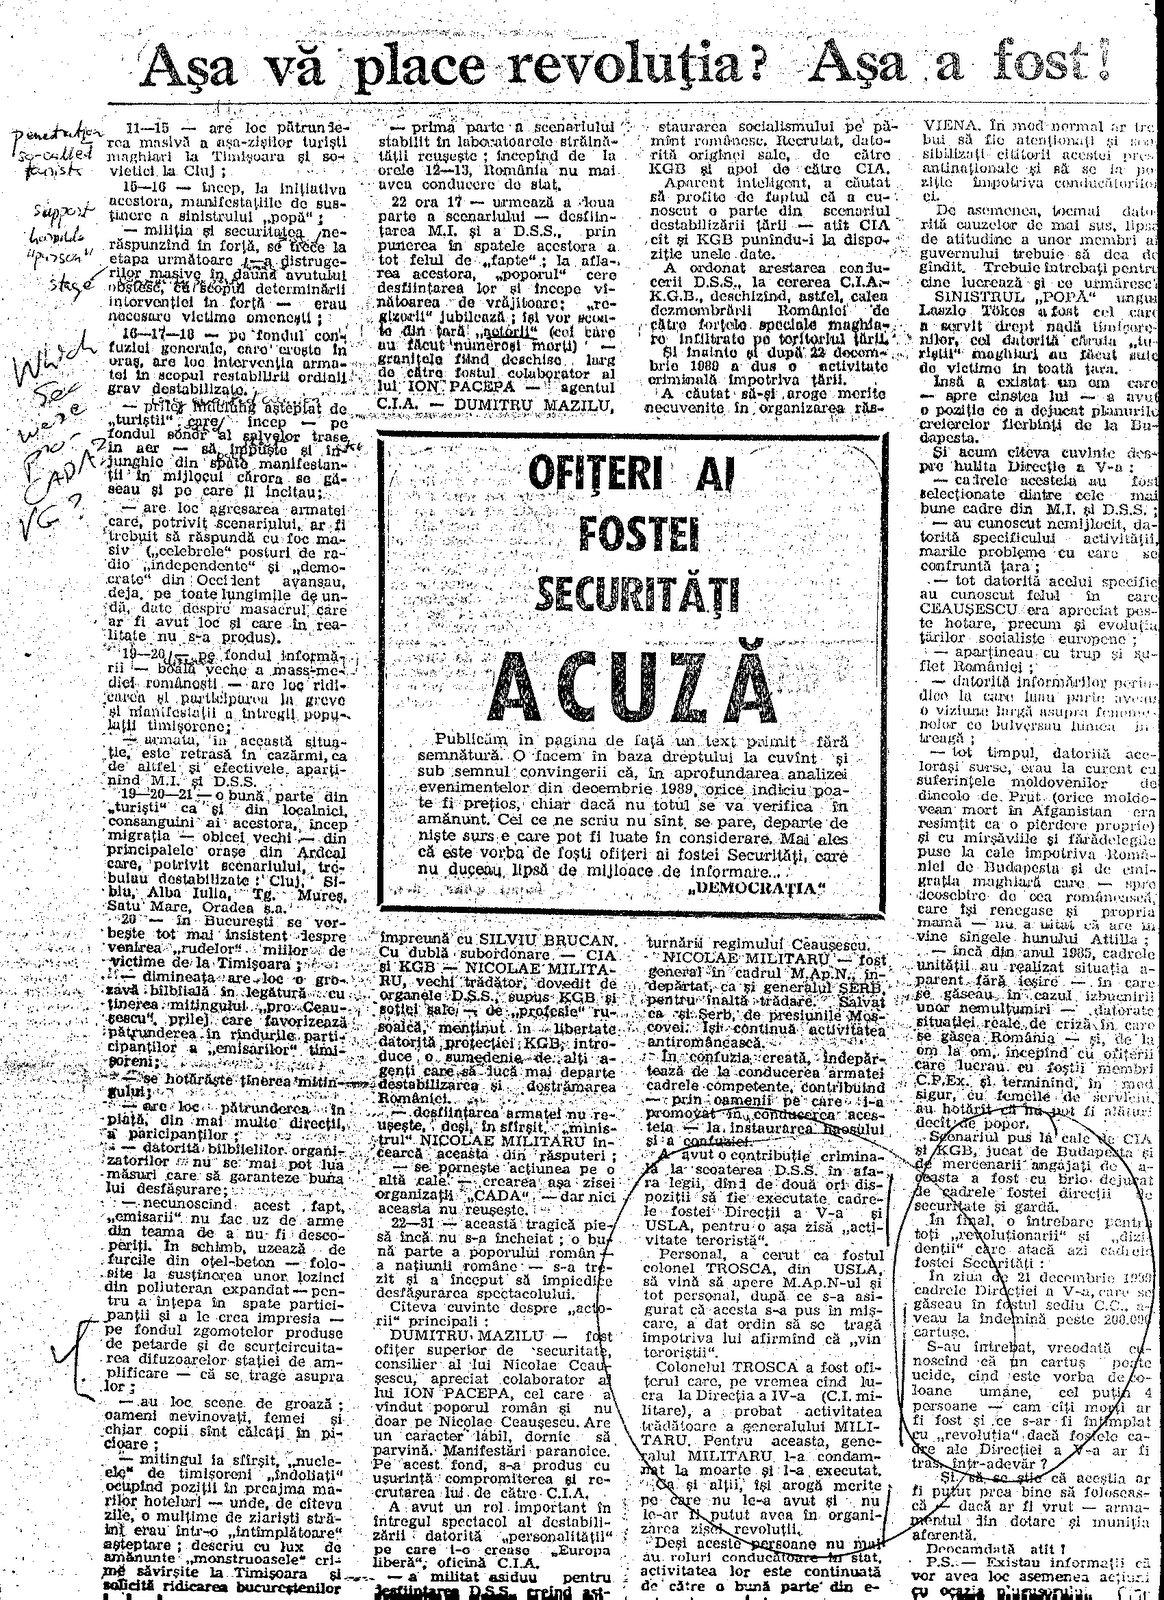 https://romanianrevolutionofdecember1989.files.wordpress.com/2010/03/top-153.jpg